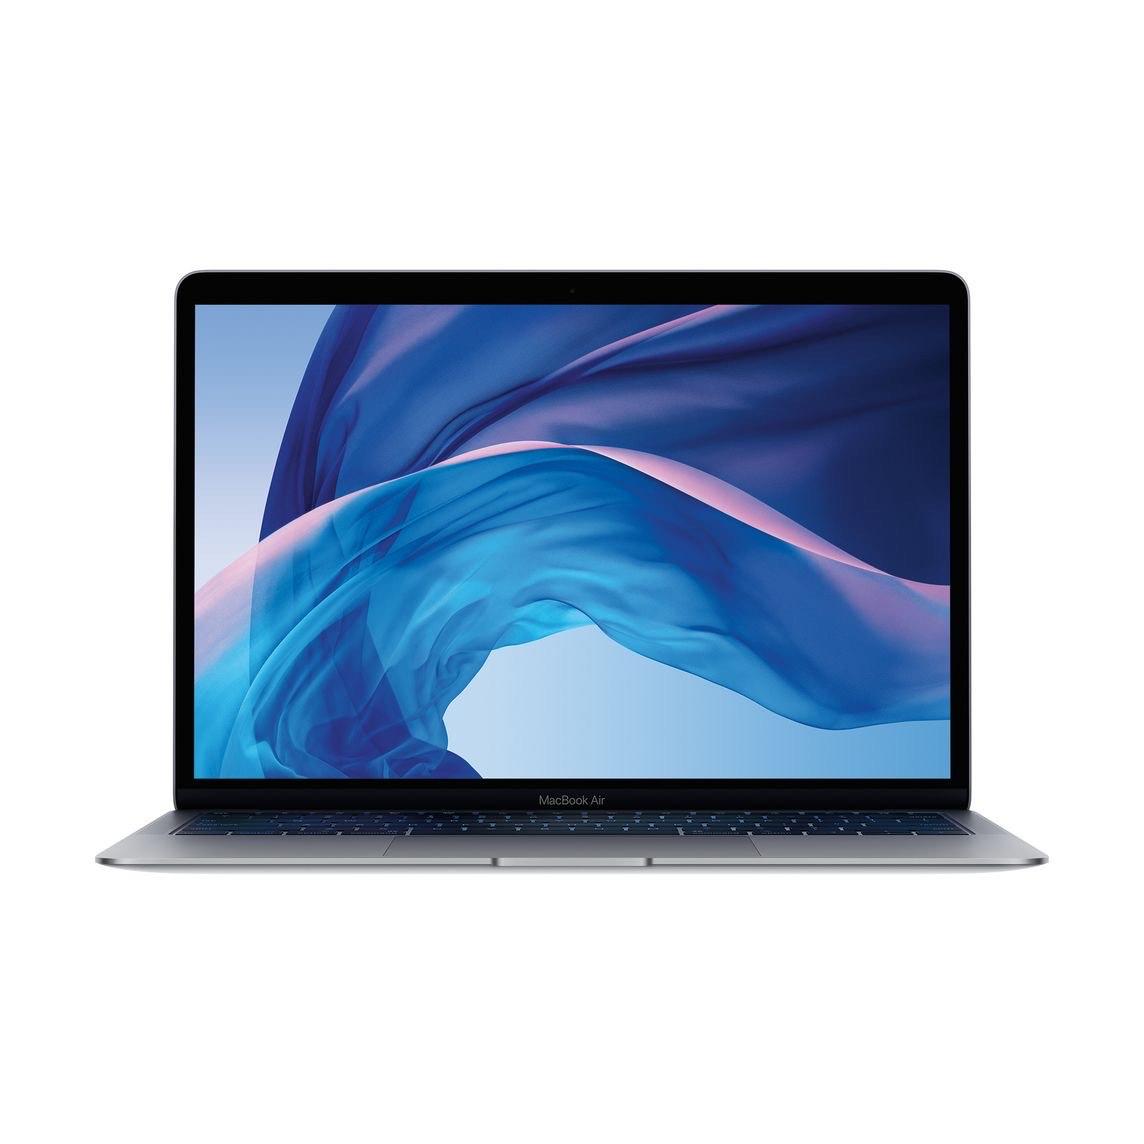 Apple MacBook Air 2019. 1.6 Intel i5. 8gb ram. 128gb. Apple Refurbished - £619 @ Apple Store